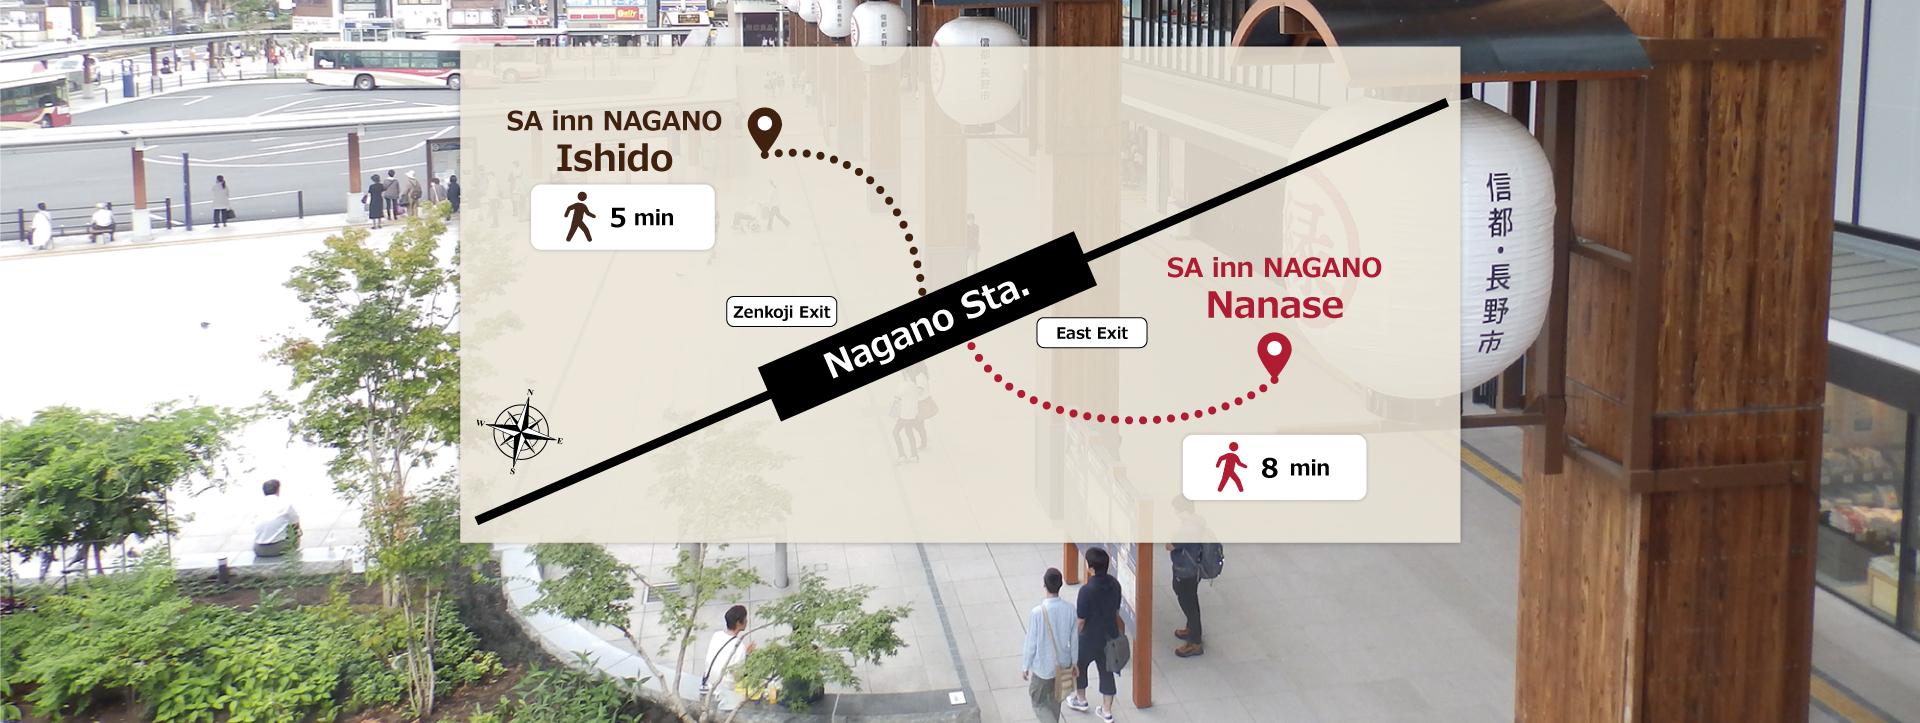 From Nagano-Staion To SA Inn Hotel